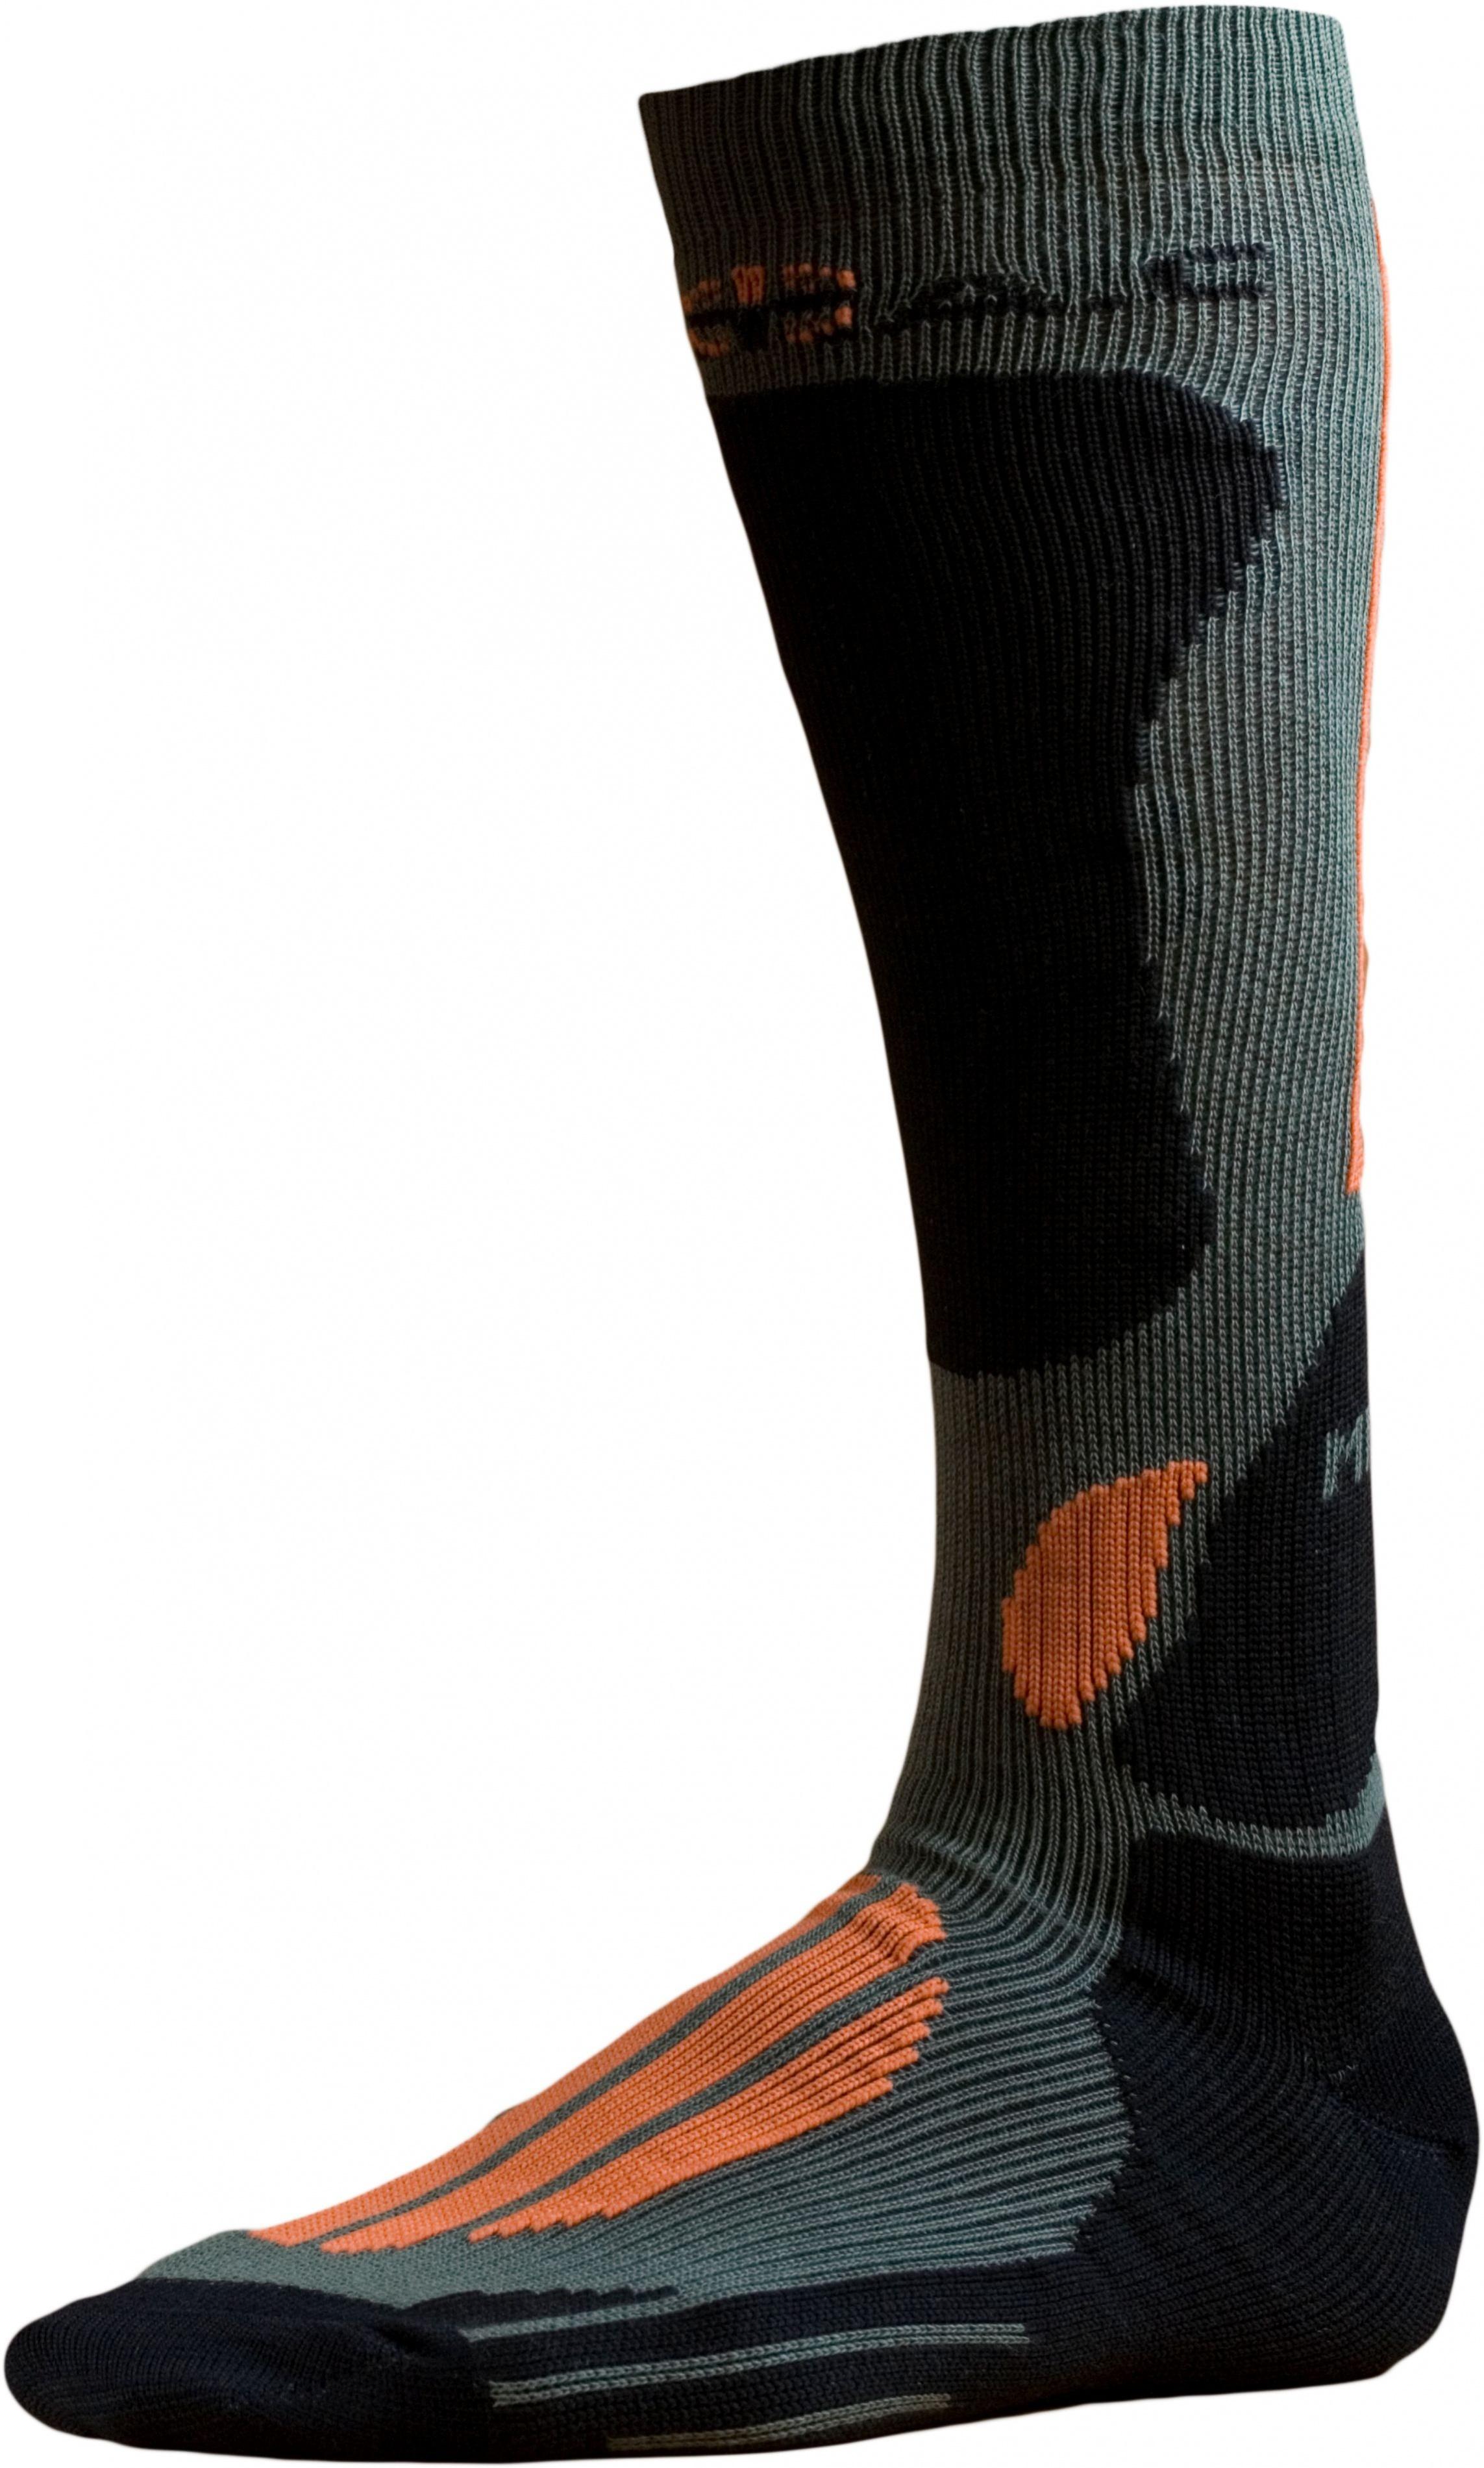 Ponožky BATAC Mission MI02 vel. 39-41 - olive/orange